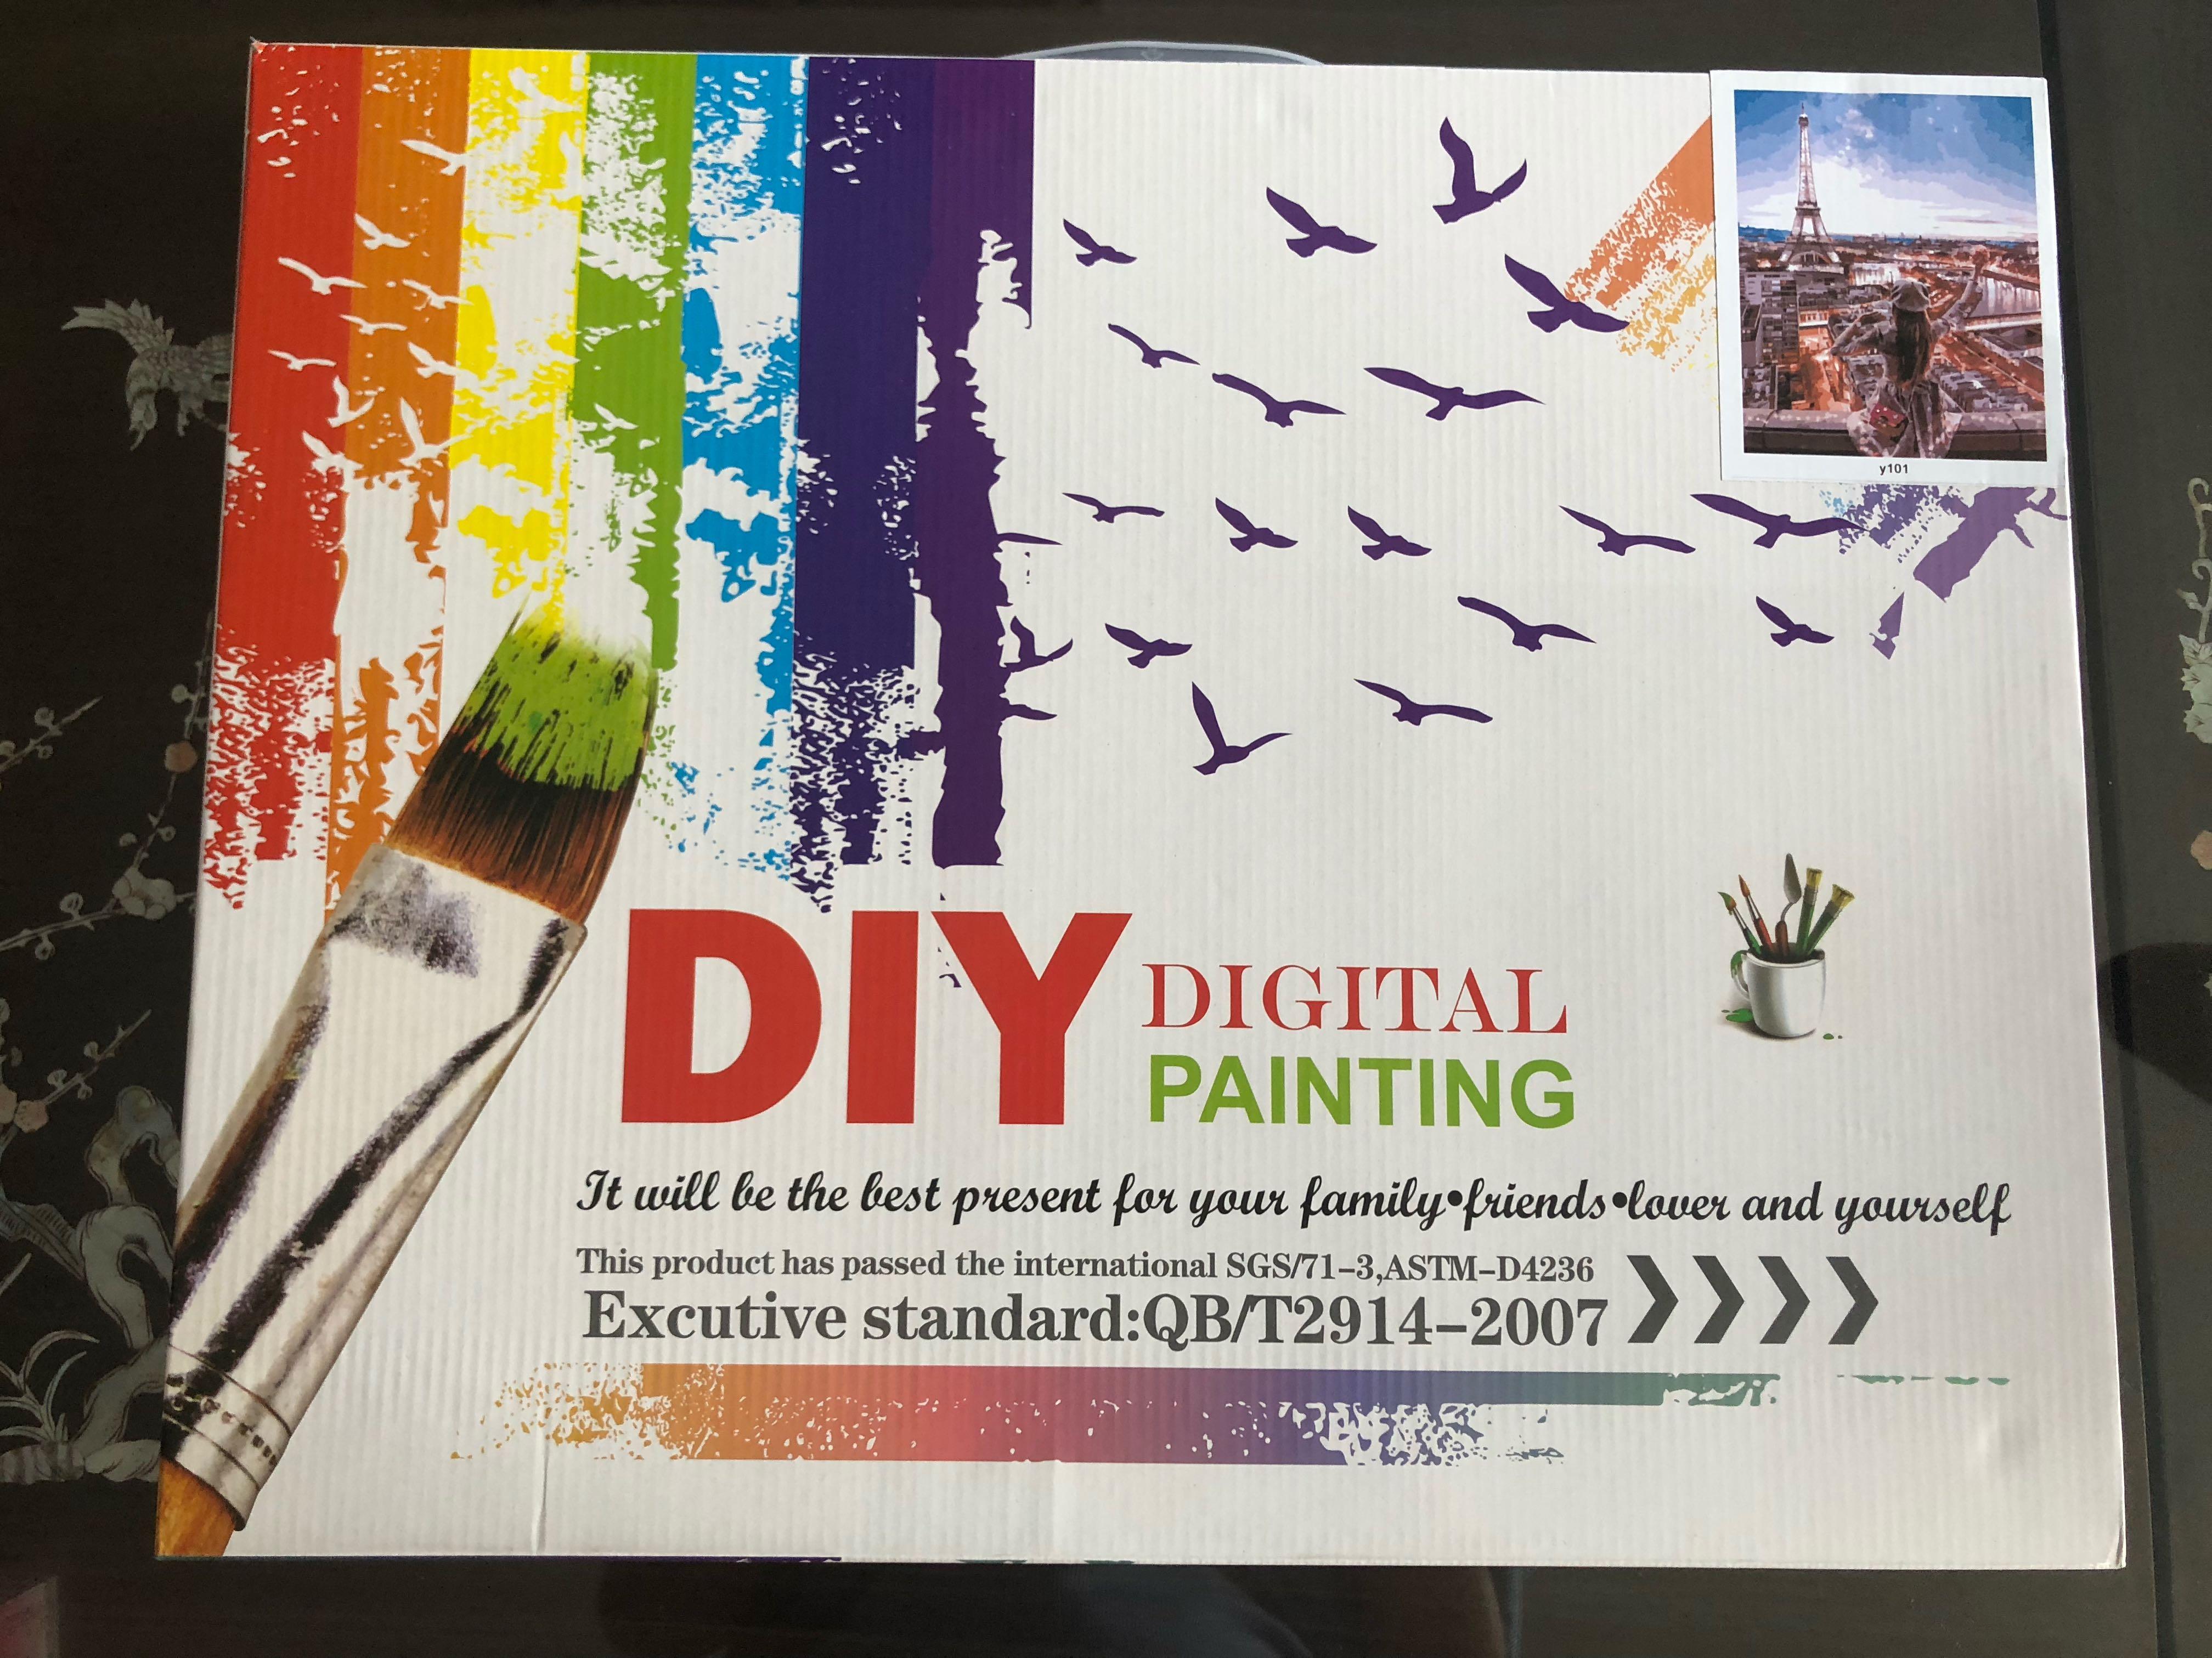 Diy Digital Painting Design Craft Art Prints On Carousell